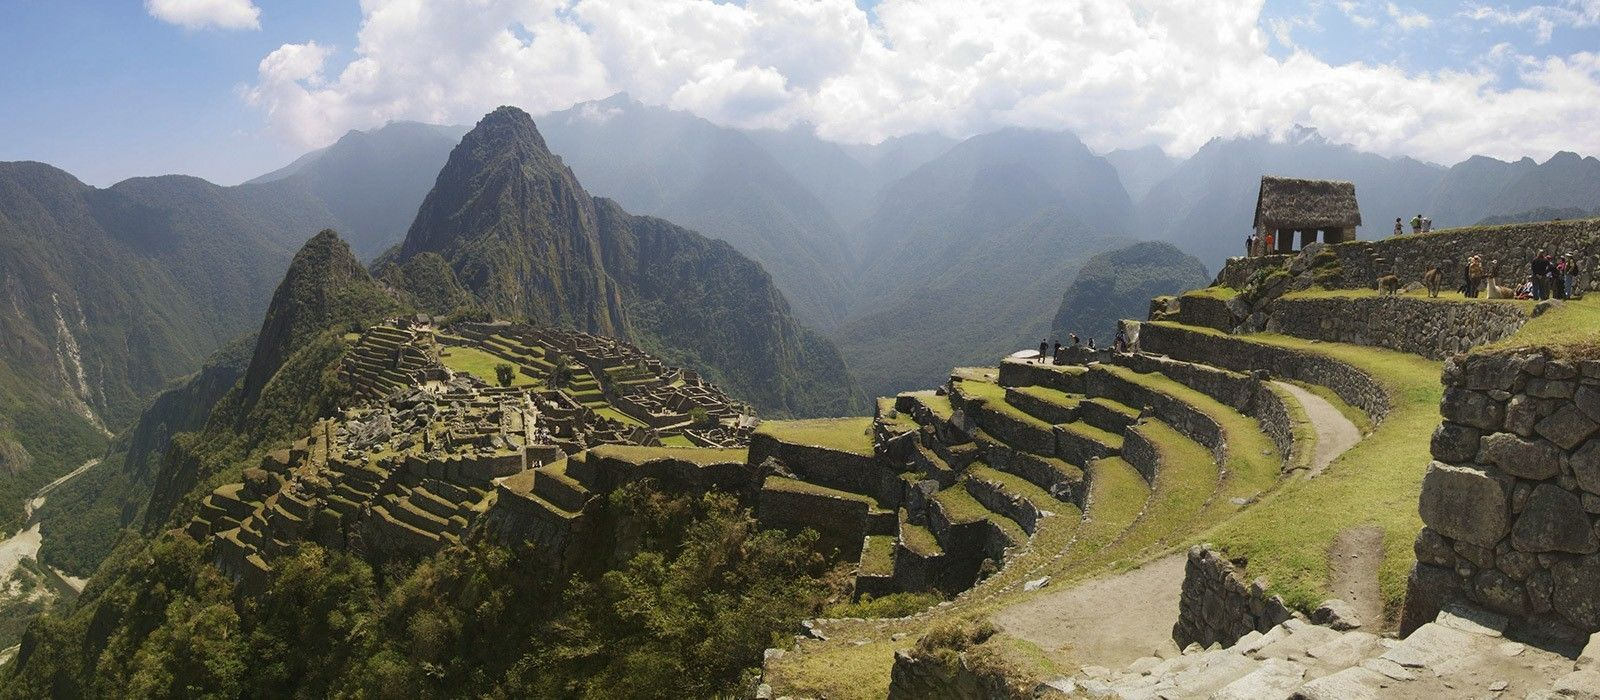 South America: Top 5 Travel Treats Tour Trip 2